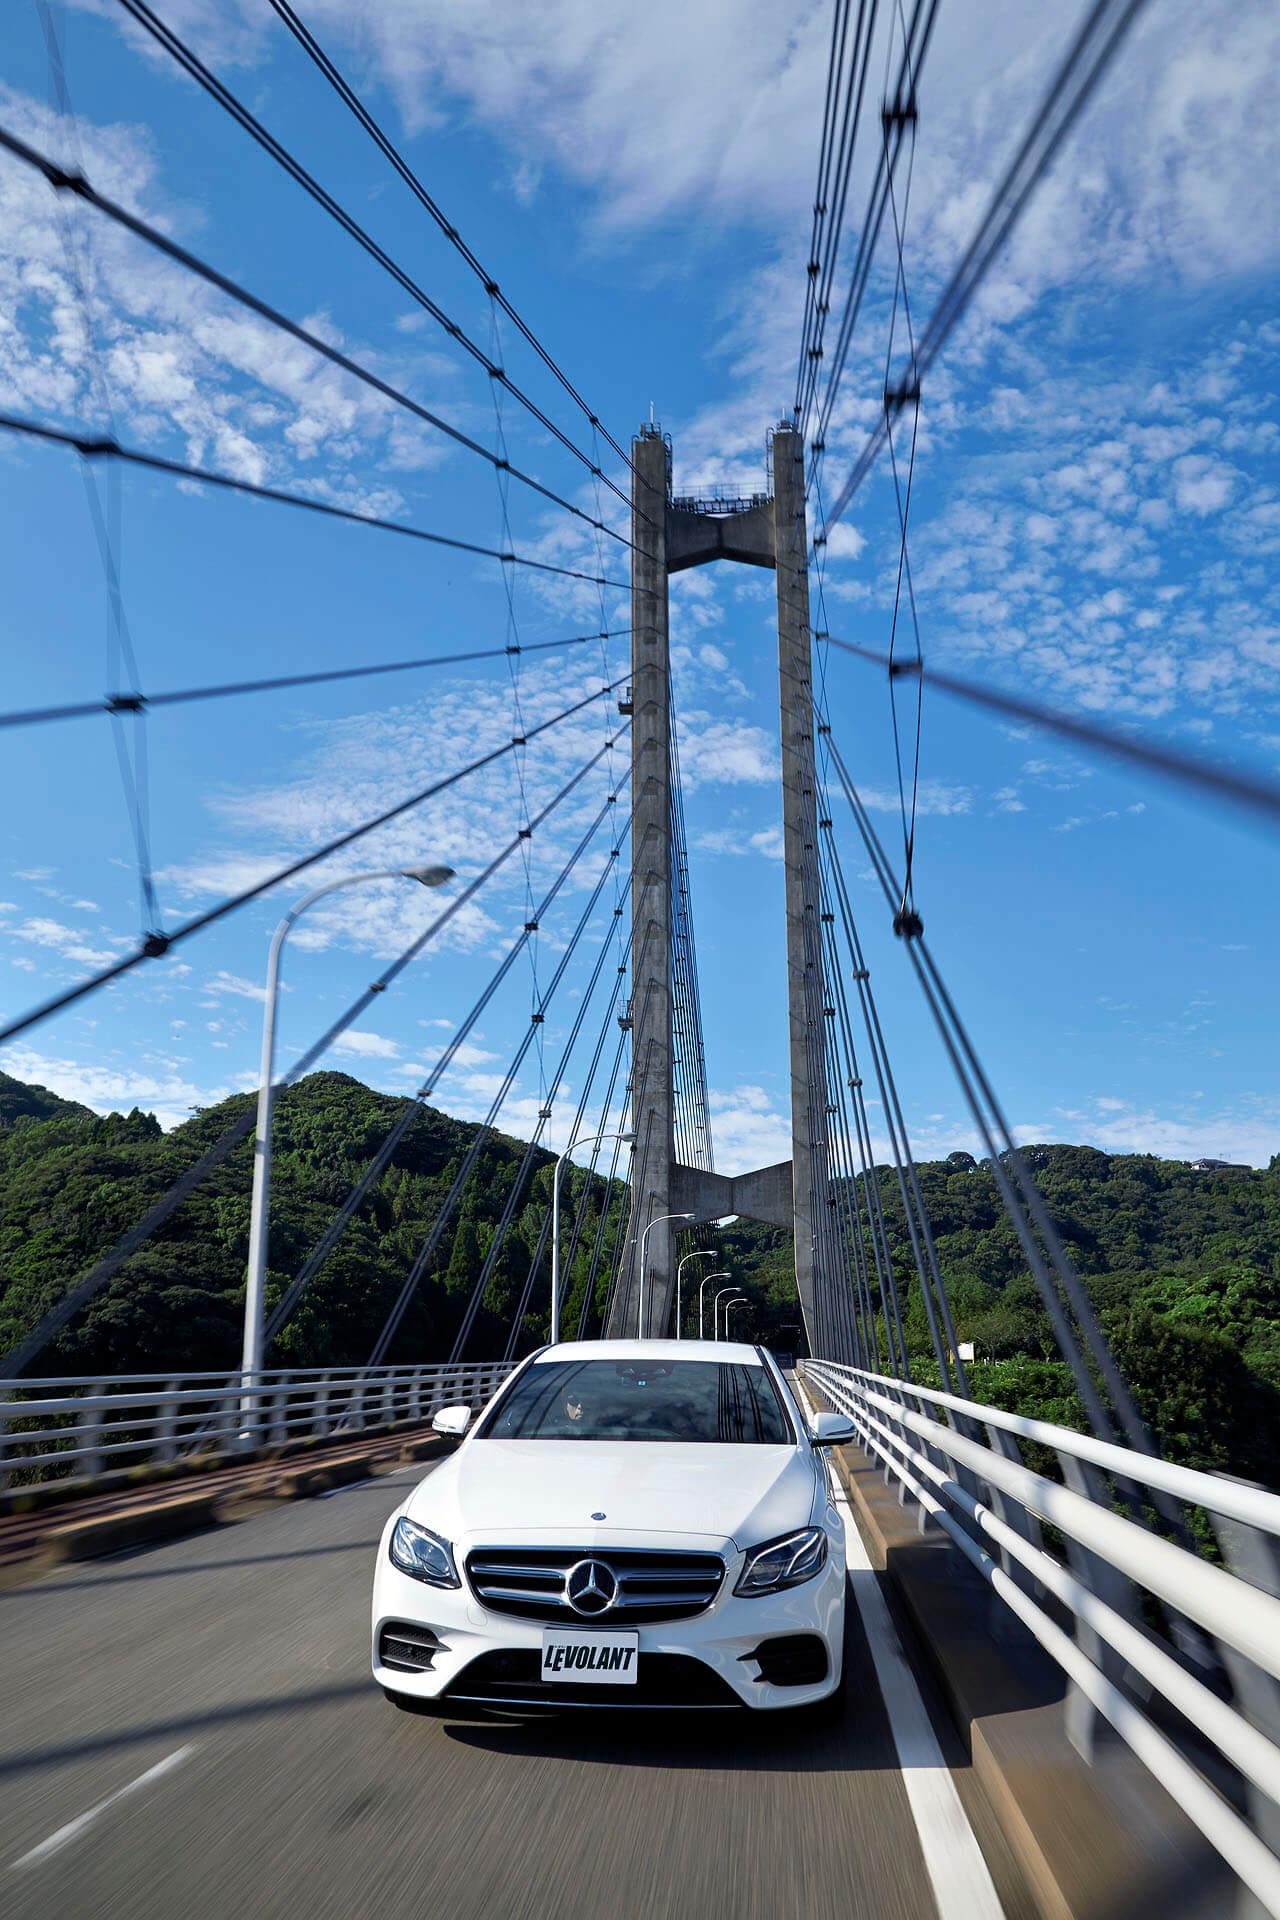 【YANASE presents 】「この道、この旅。」~佐賀県・国道204号線 編 - %e4%bd%90%e8%b3%80%e3%80%80%e3%83%89%e3%83%a9%e3%82%a4%e3%83%96-drive-5